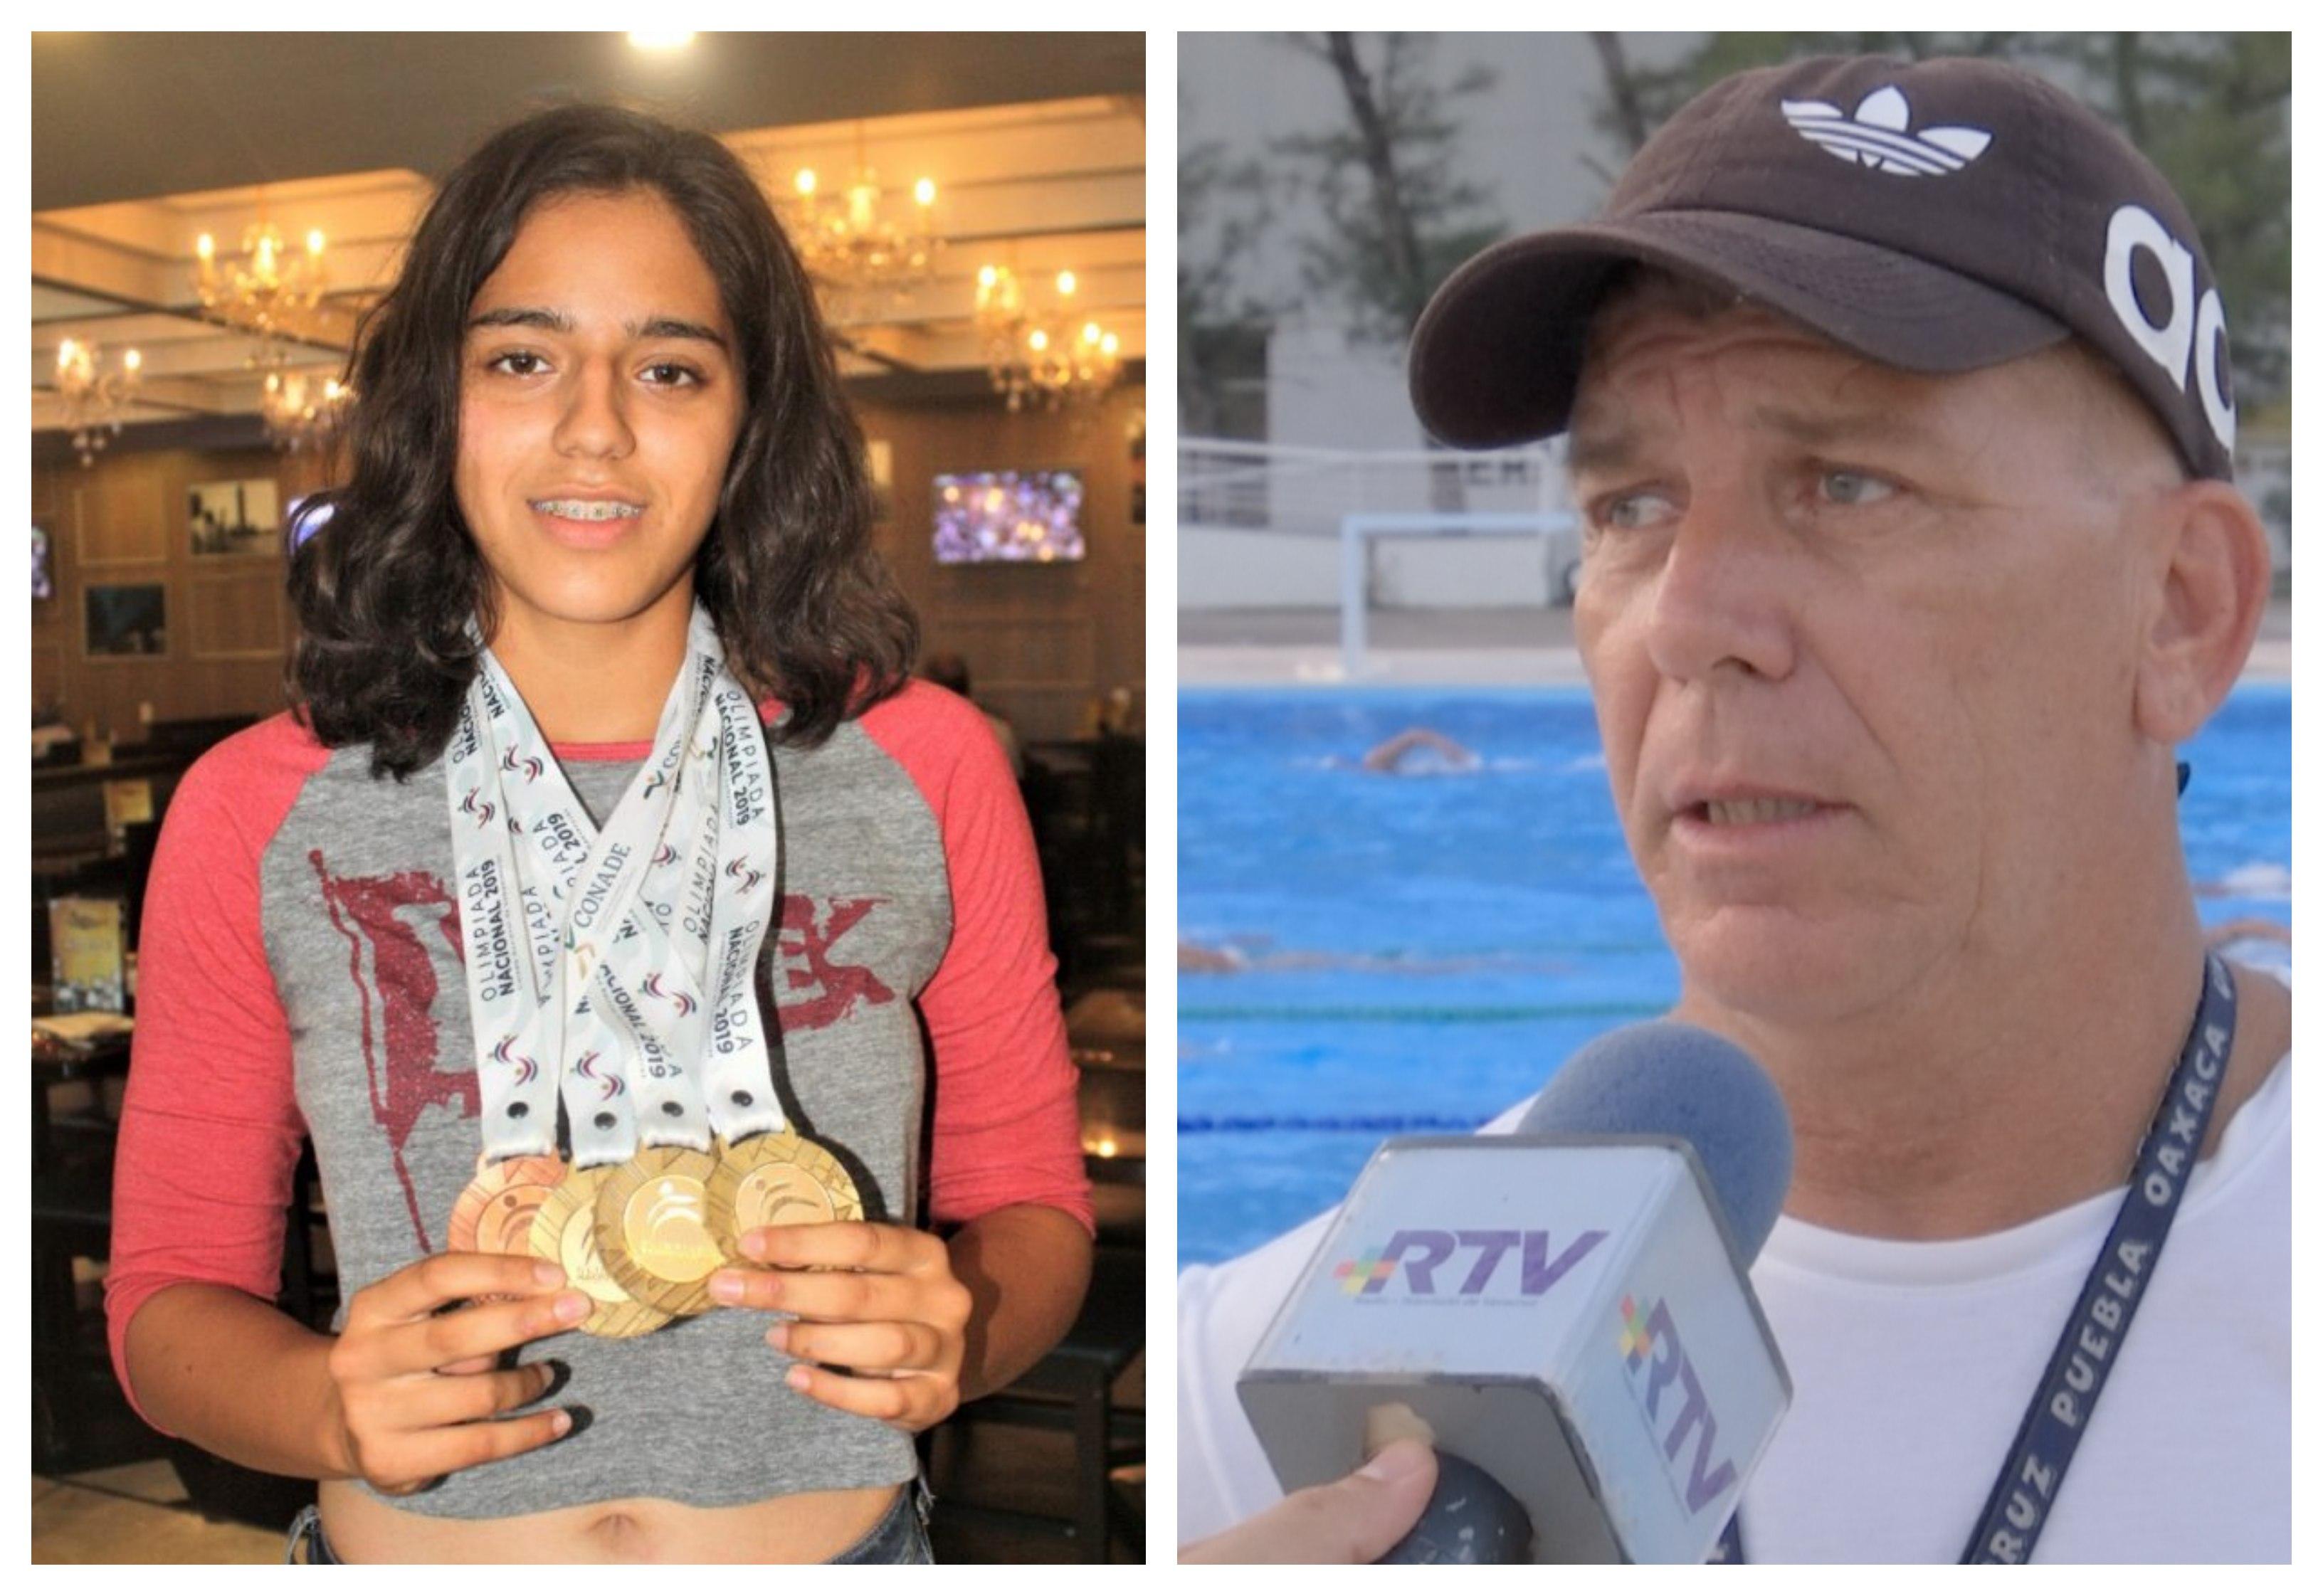 Proyectan a la nadadora Susana Hernández rumbo a París 2024